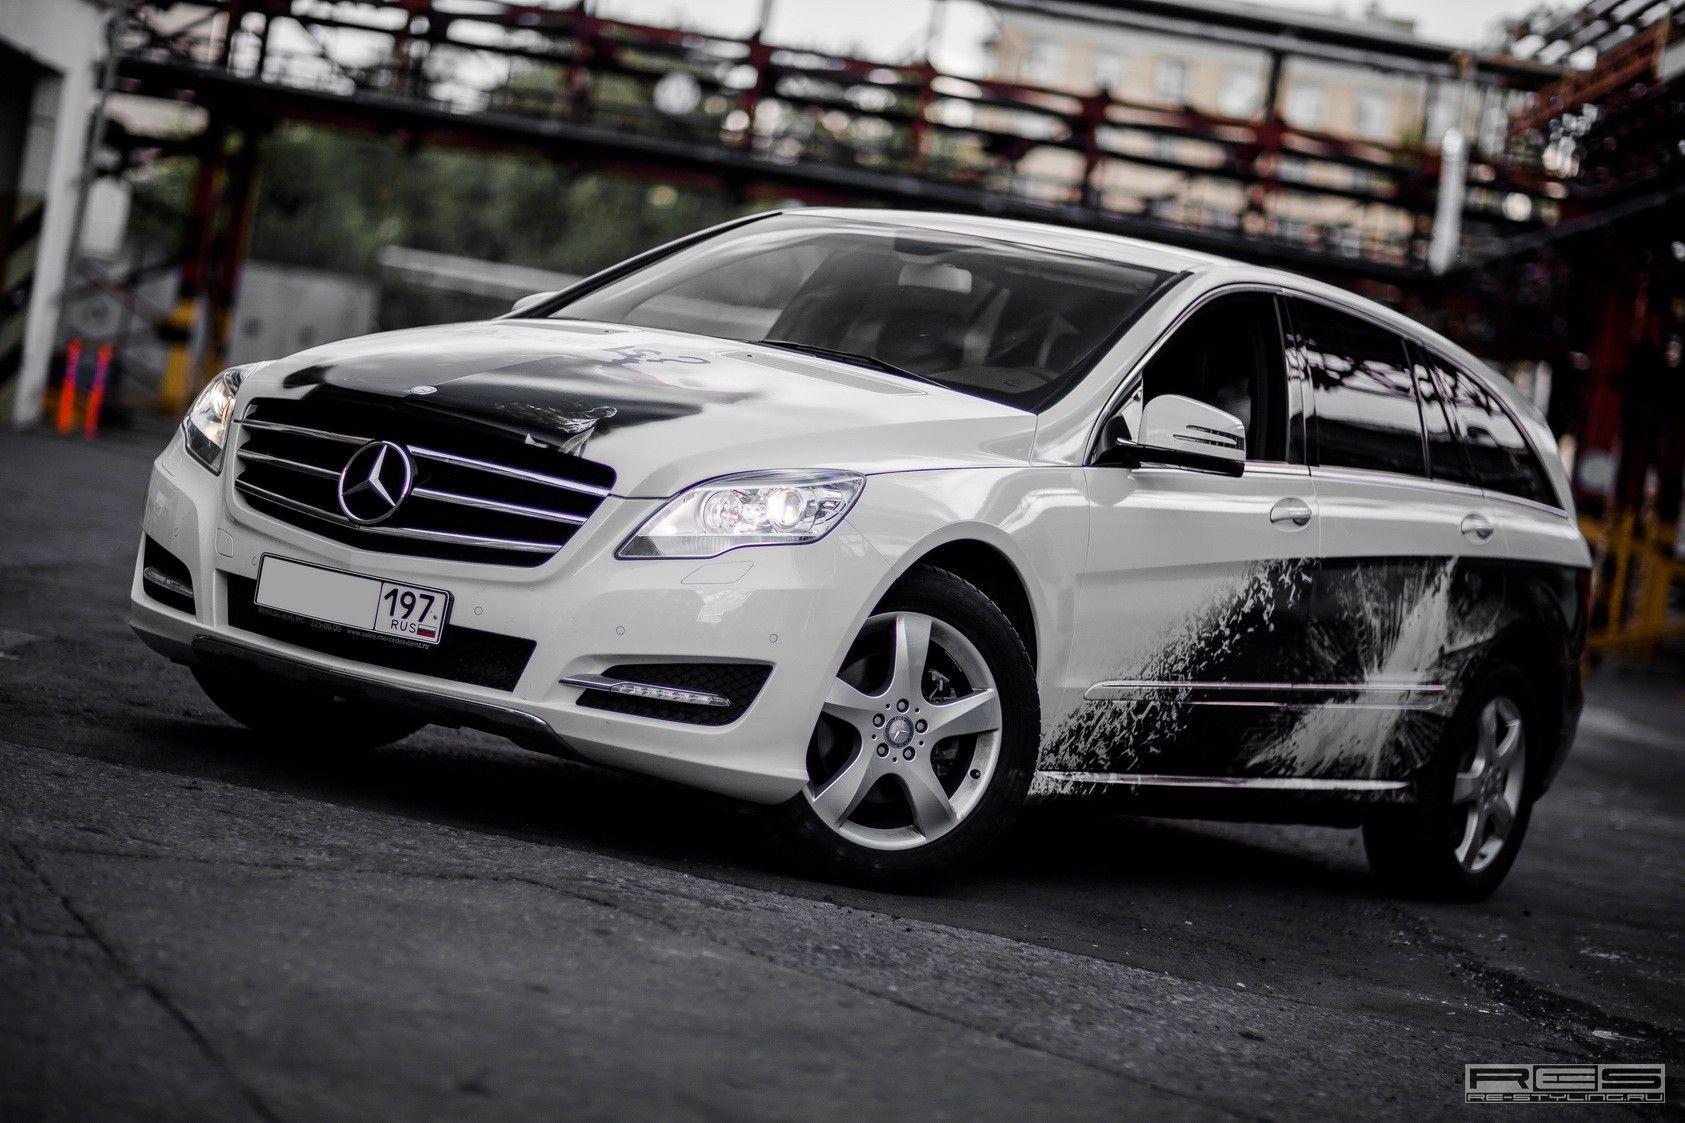 Batman Mercedes RClass Mercedes r class, Mercedes benz